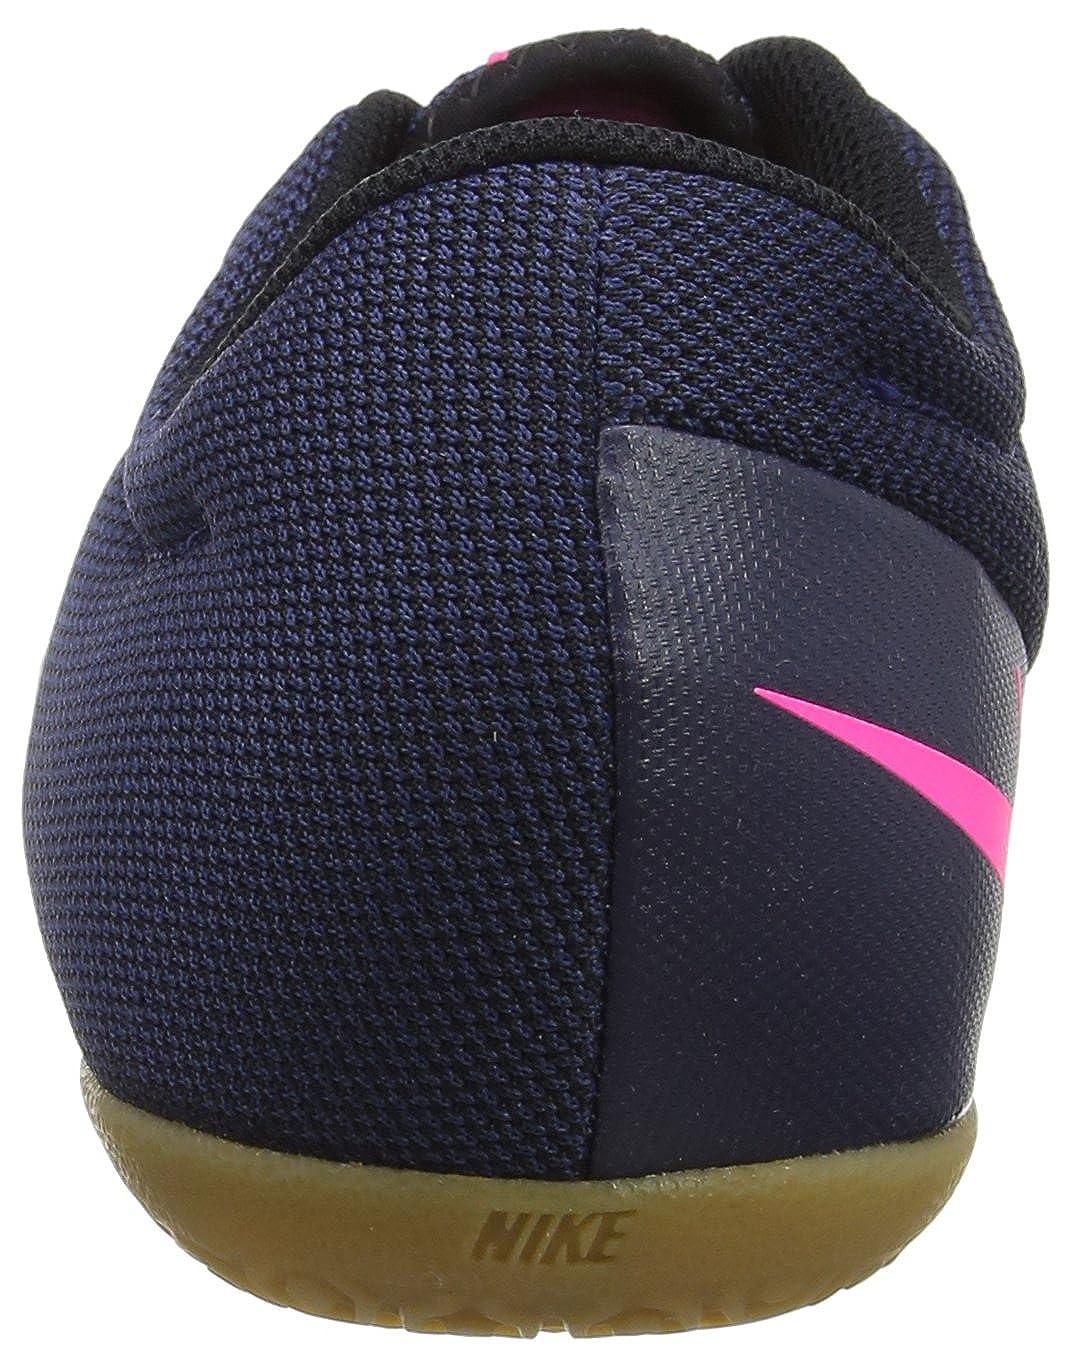 Nike Herren MercurialX Pro Pro Pro Ic Fußballschuhe 2225e4